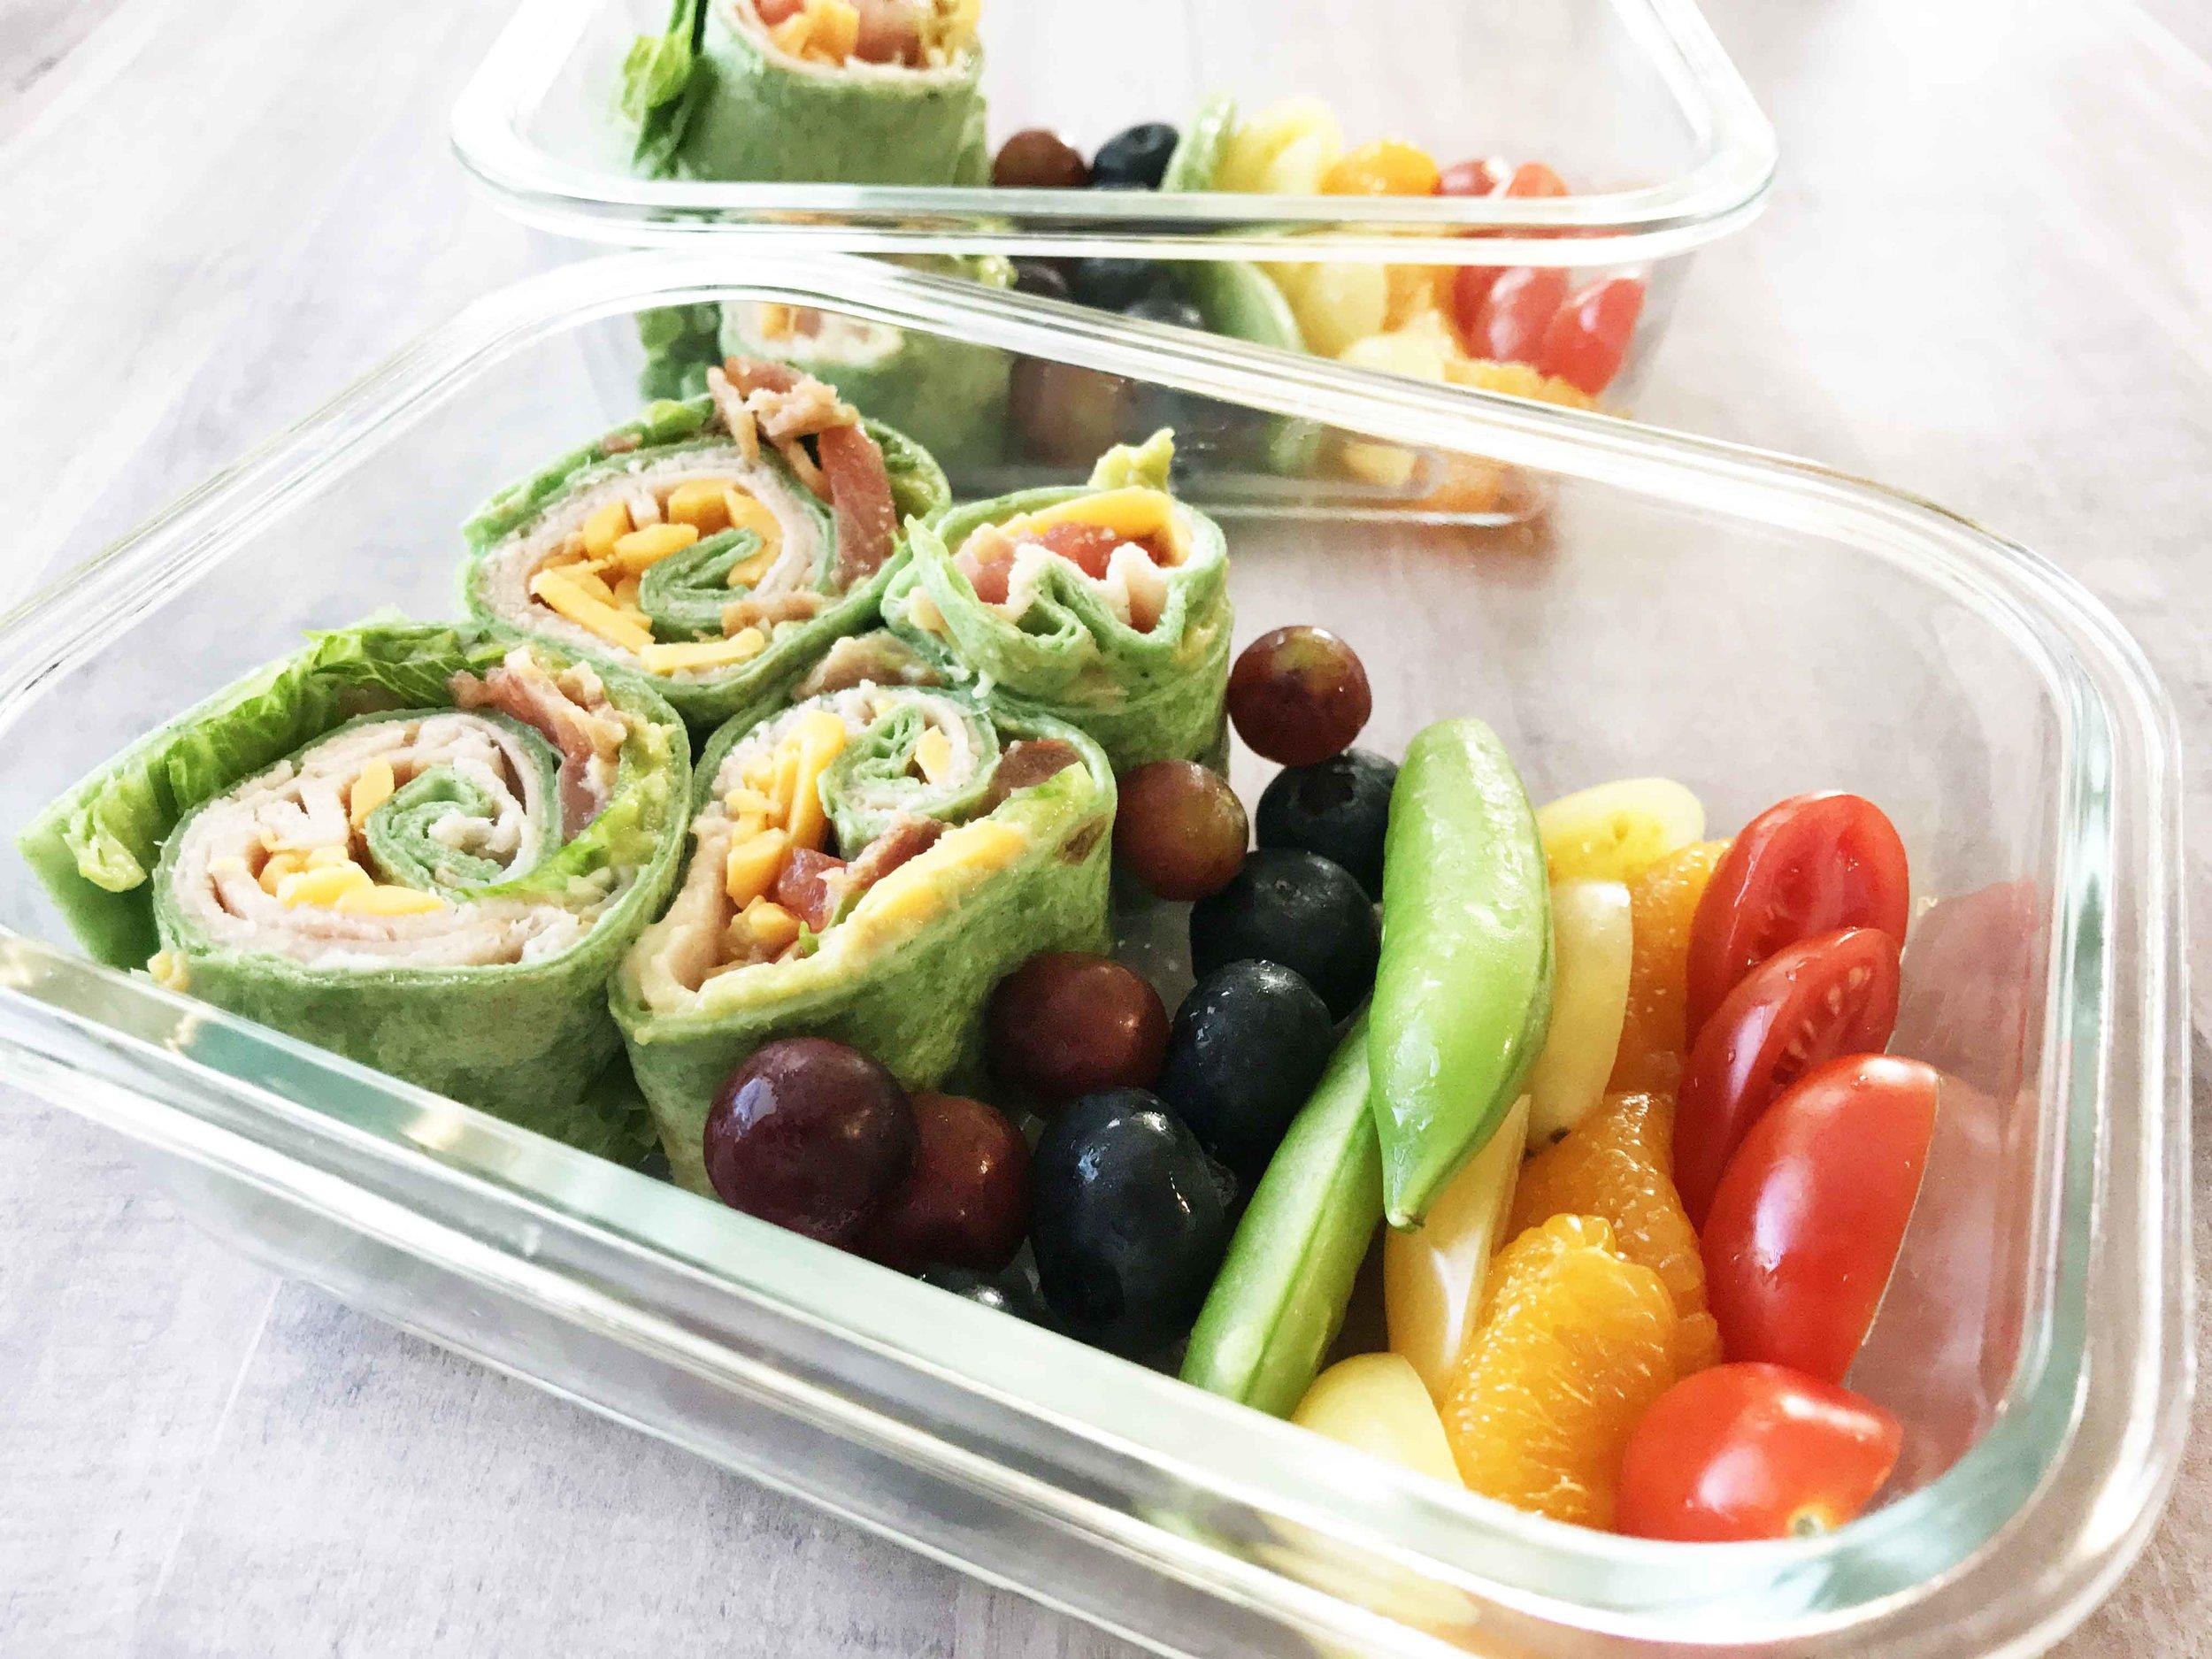 rainbow-wrap-lunch.jpg